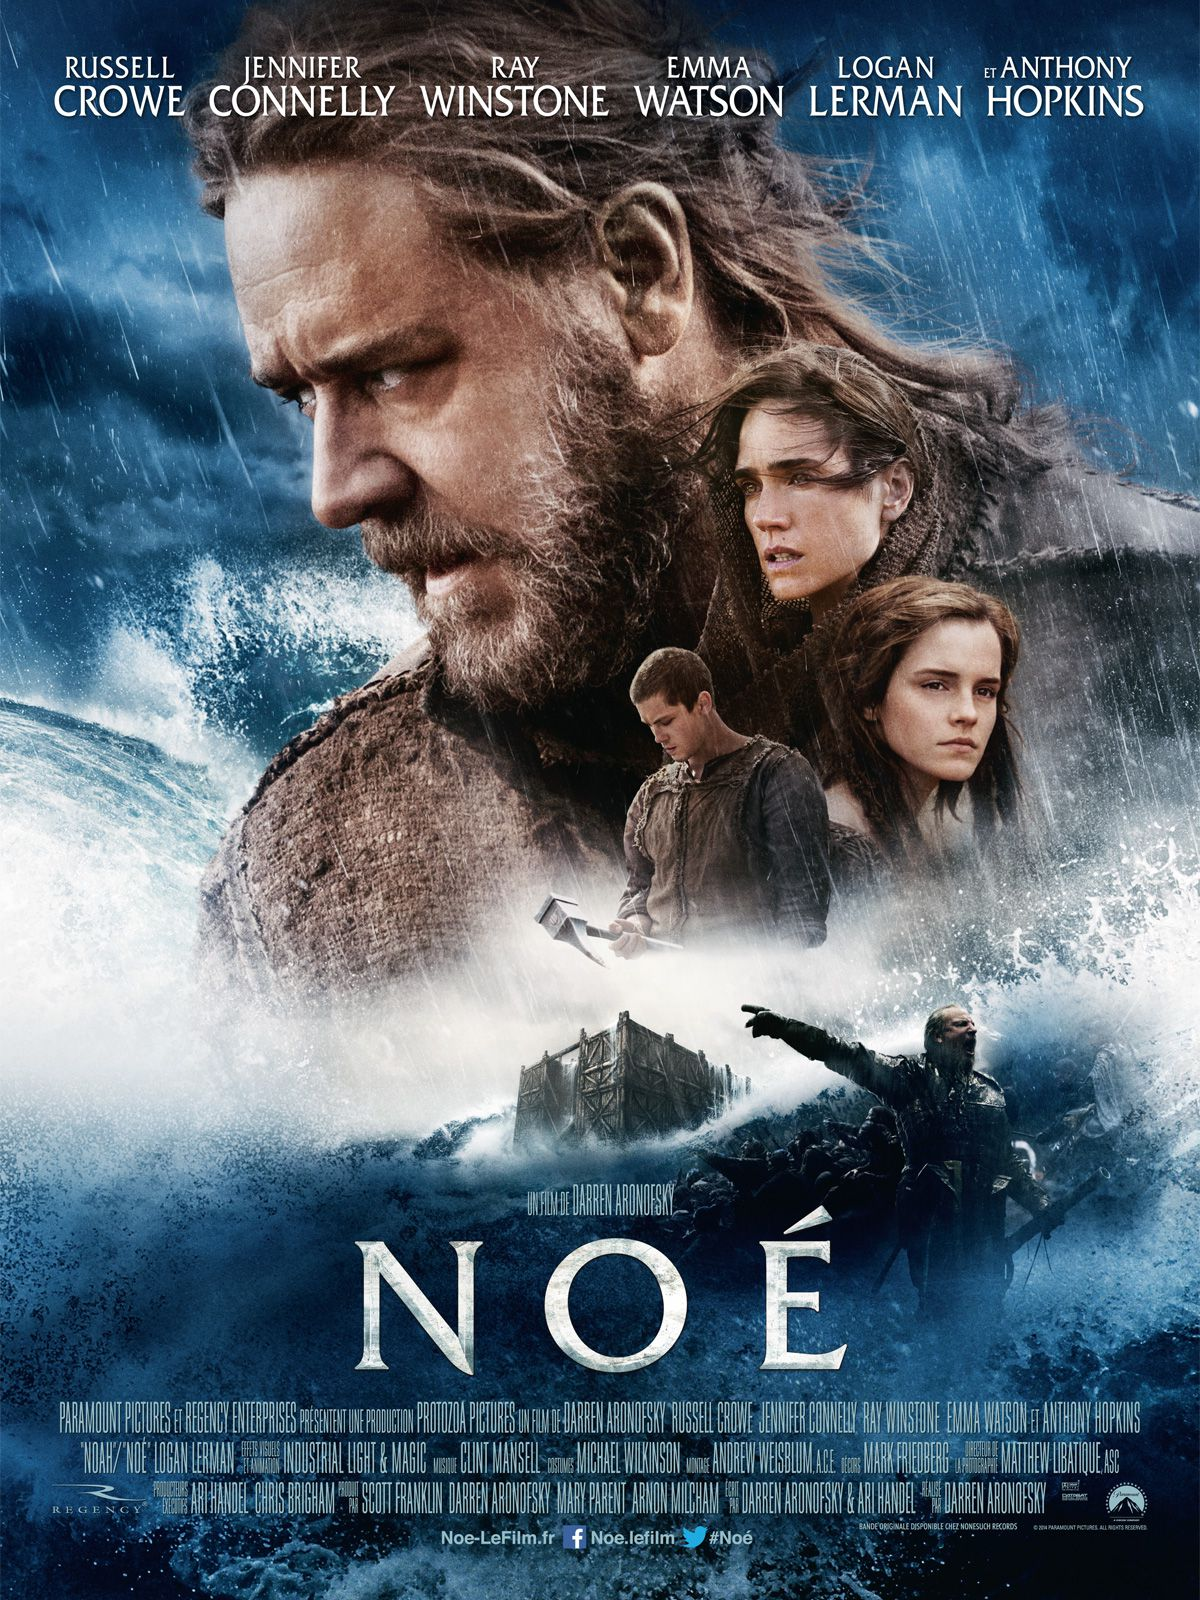 Noé - Film (2014)